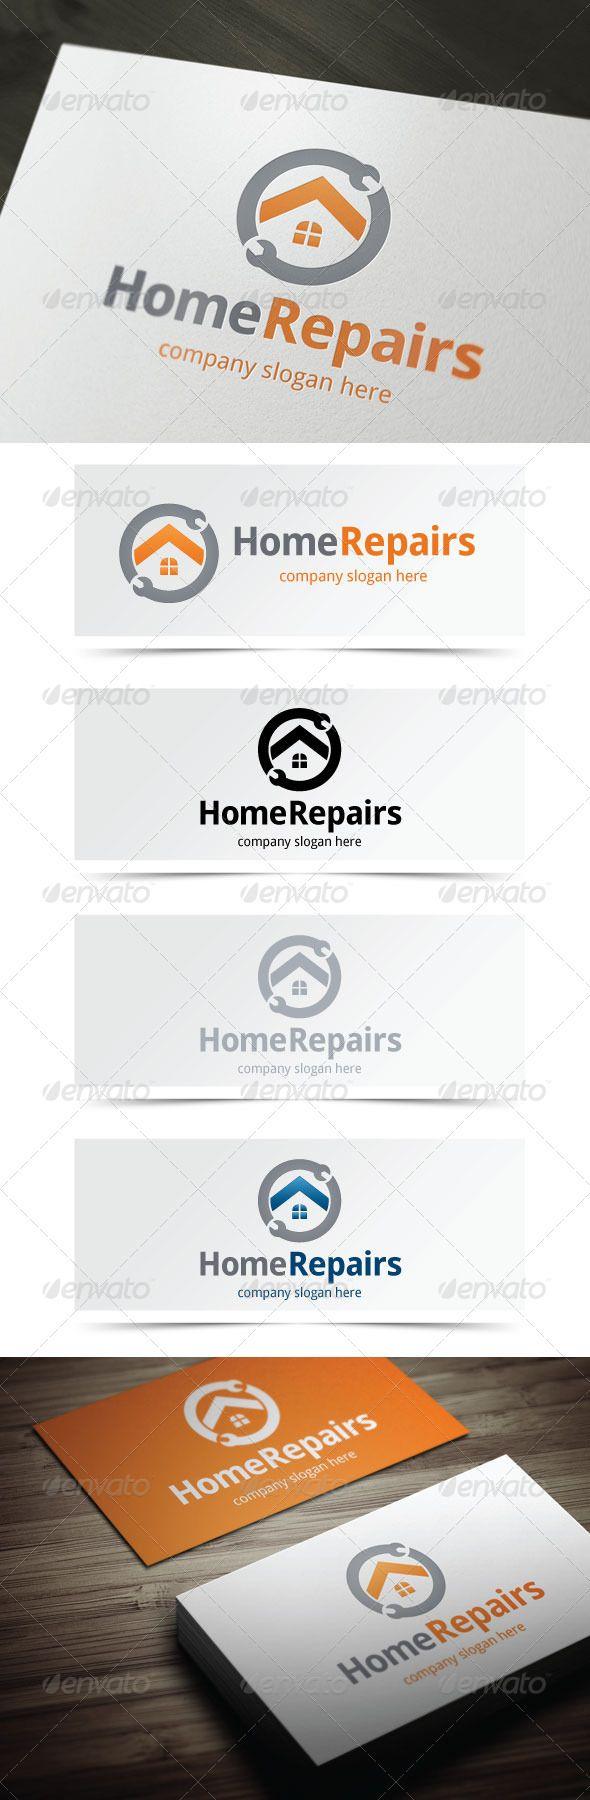 Home Repairs http://graphicriver.net/user/debo243/portfolio